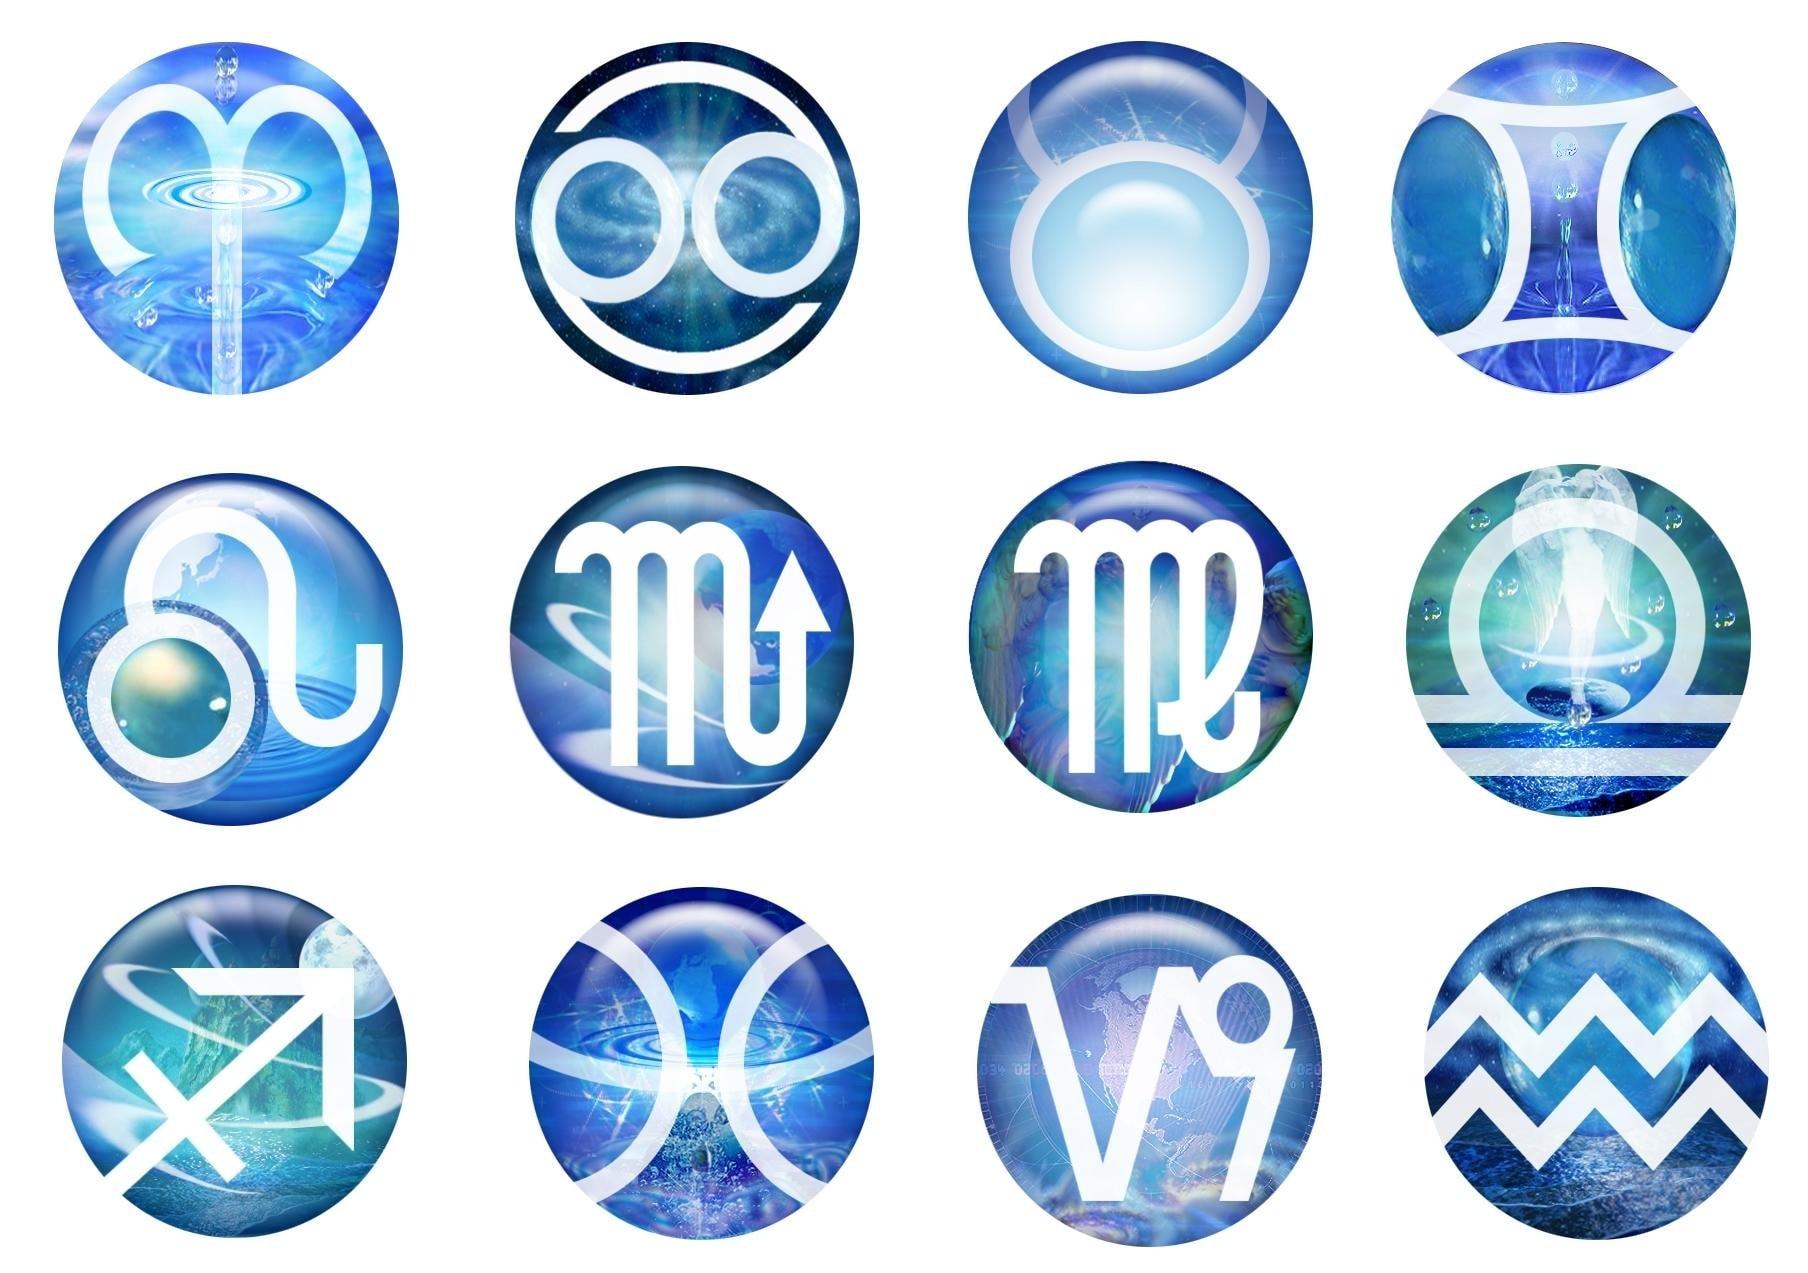 horoscope dream meaning, dream about horoscope, horoscope dream interpretation, seeing in a dream horoscope